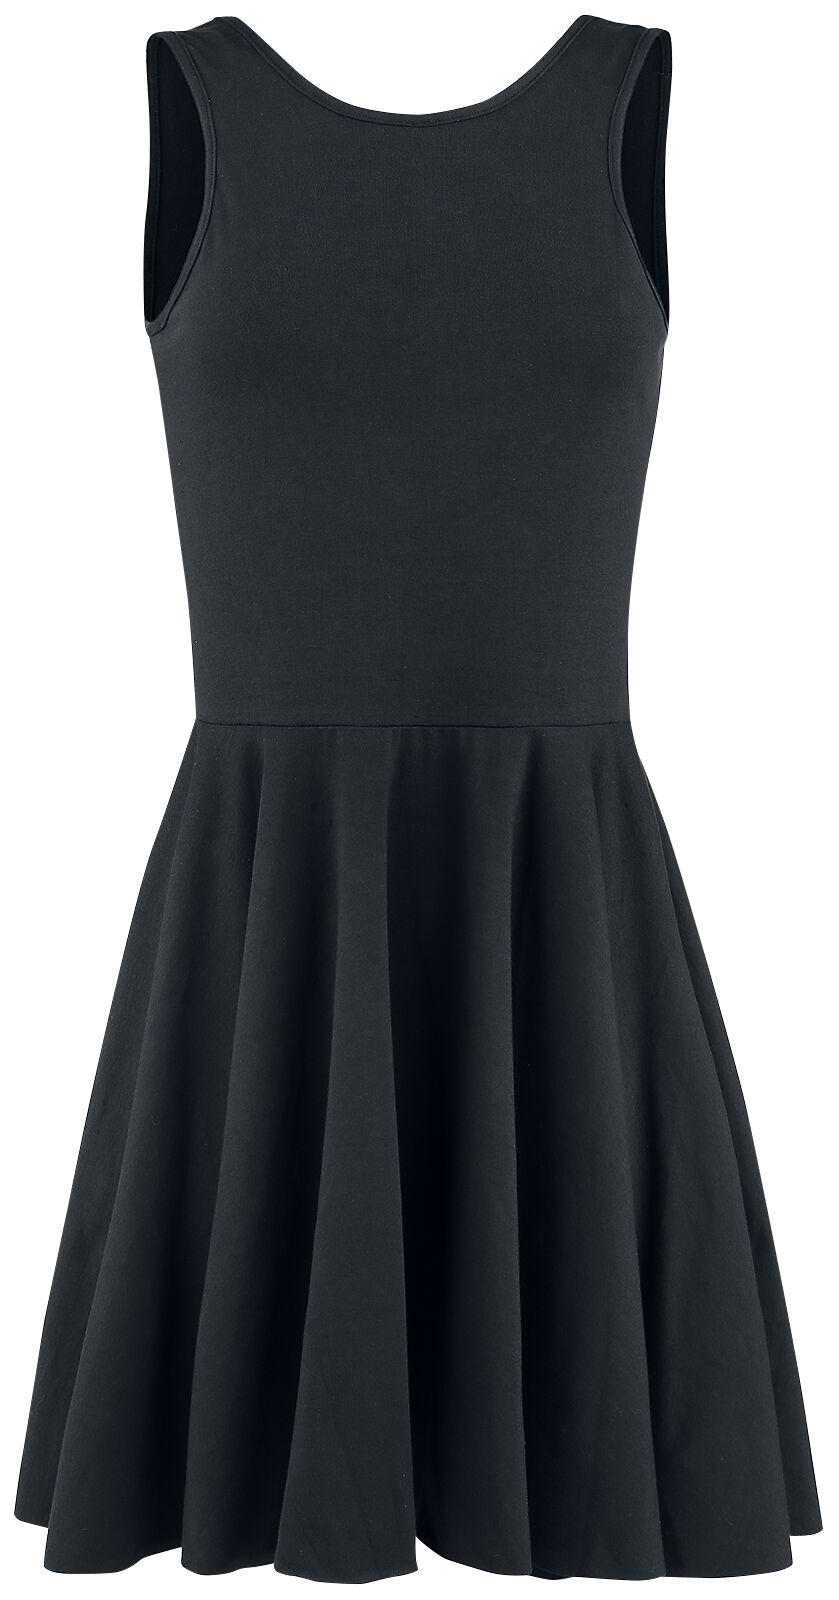 Image of   Outer Vision Reversible Dress Viana Kjole sort